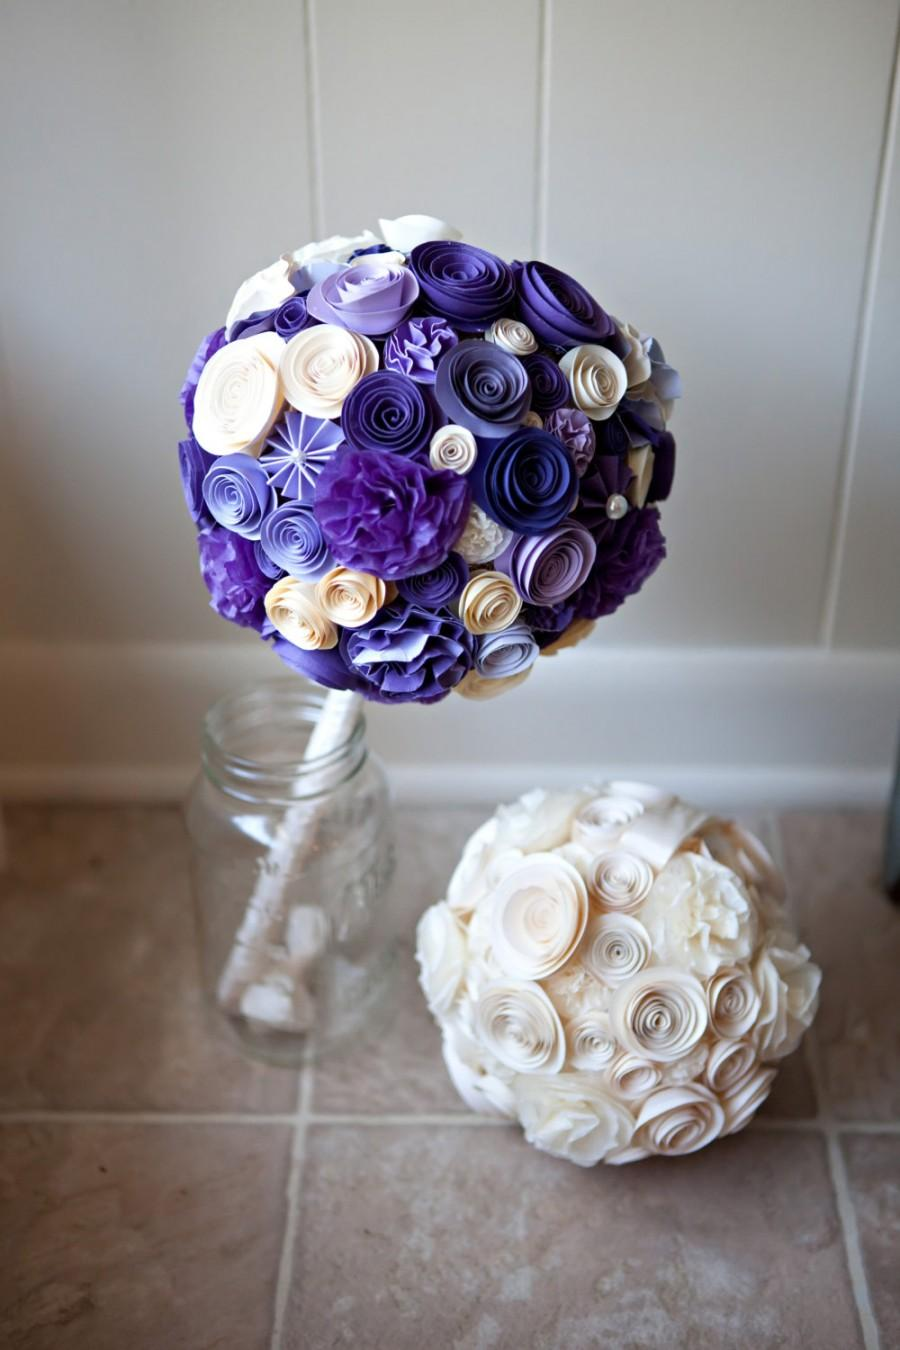 Mariage - Tissue / Paper Wedding Pomander - 7 Inches - Paper Bouquet - Bridal Arrangement